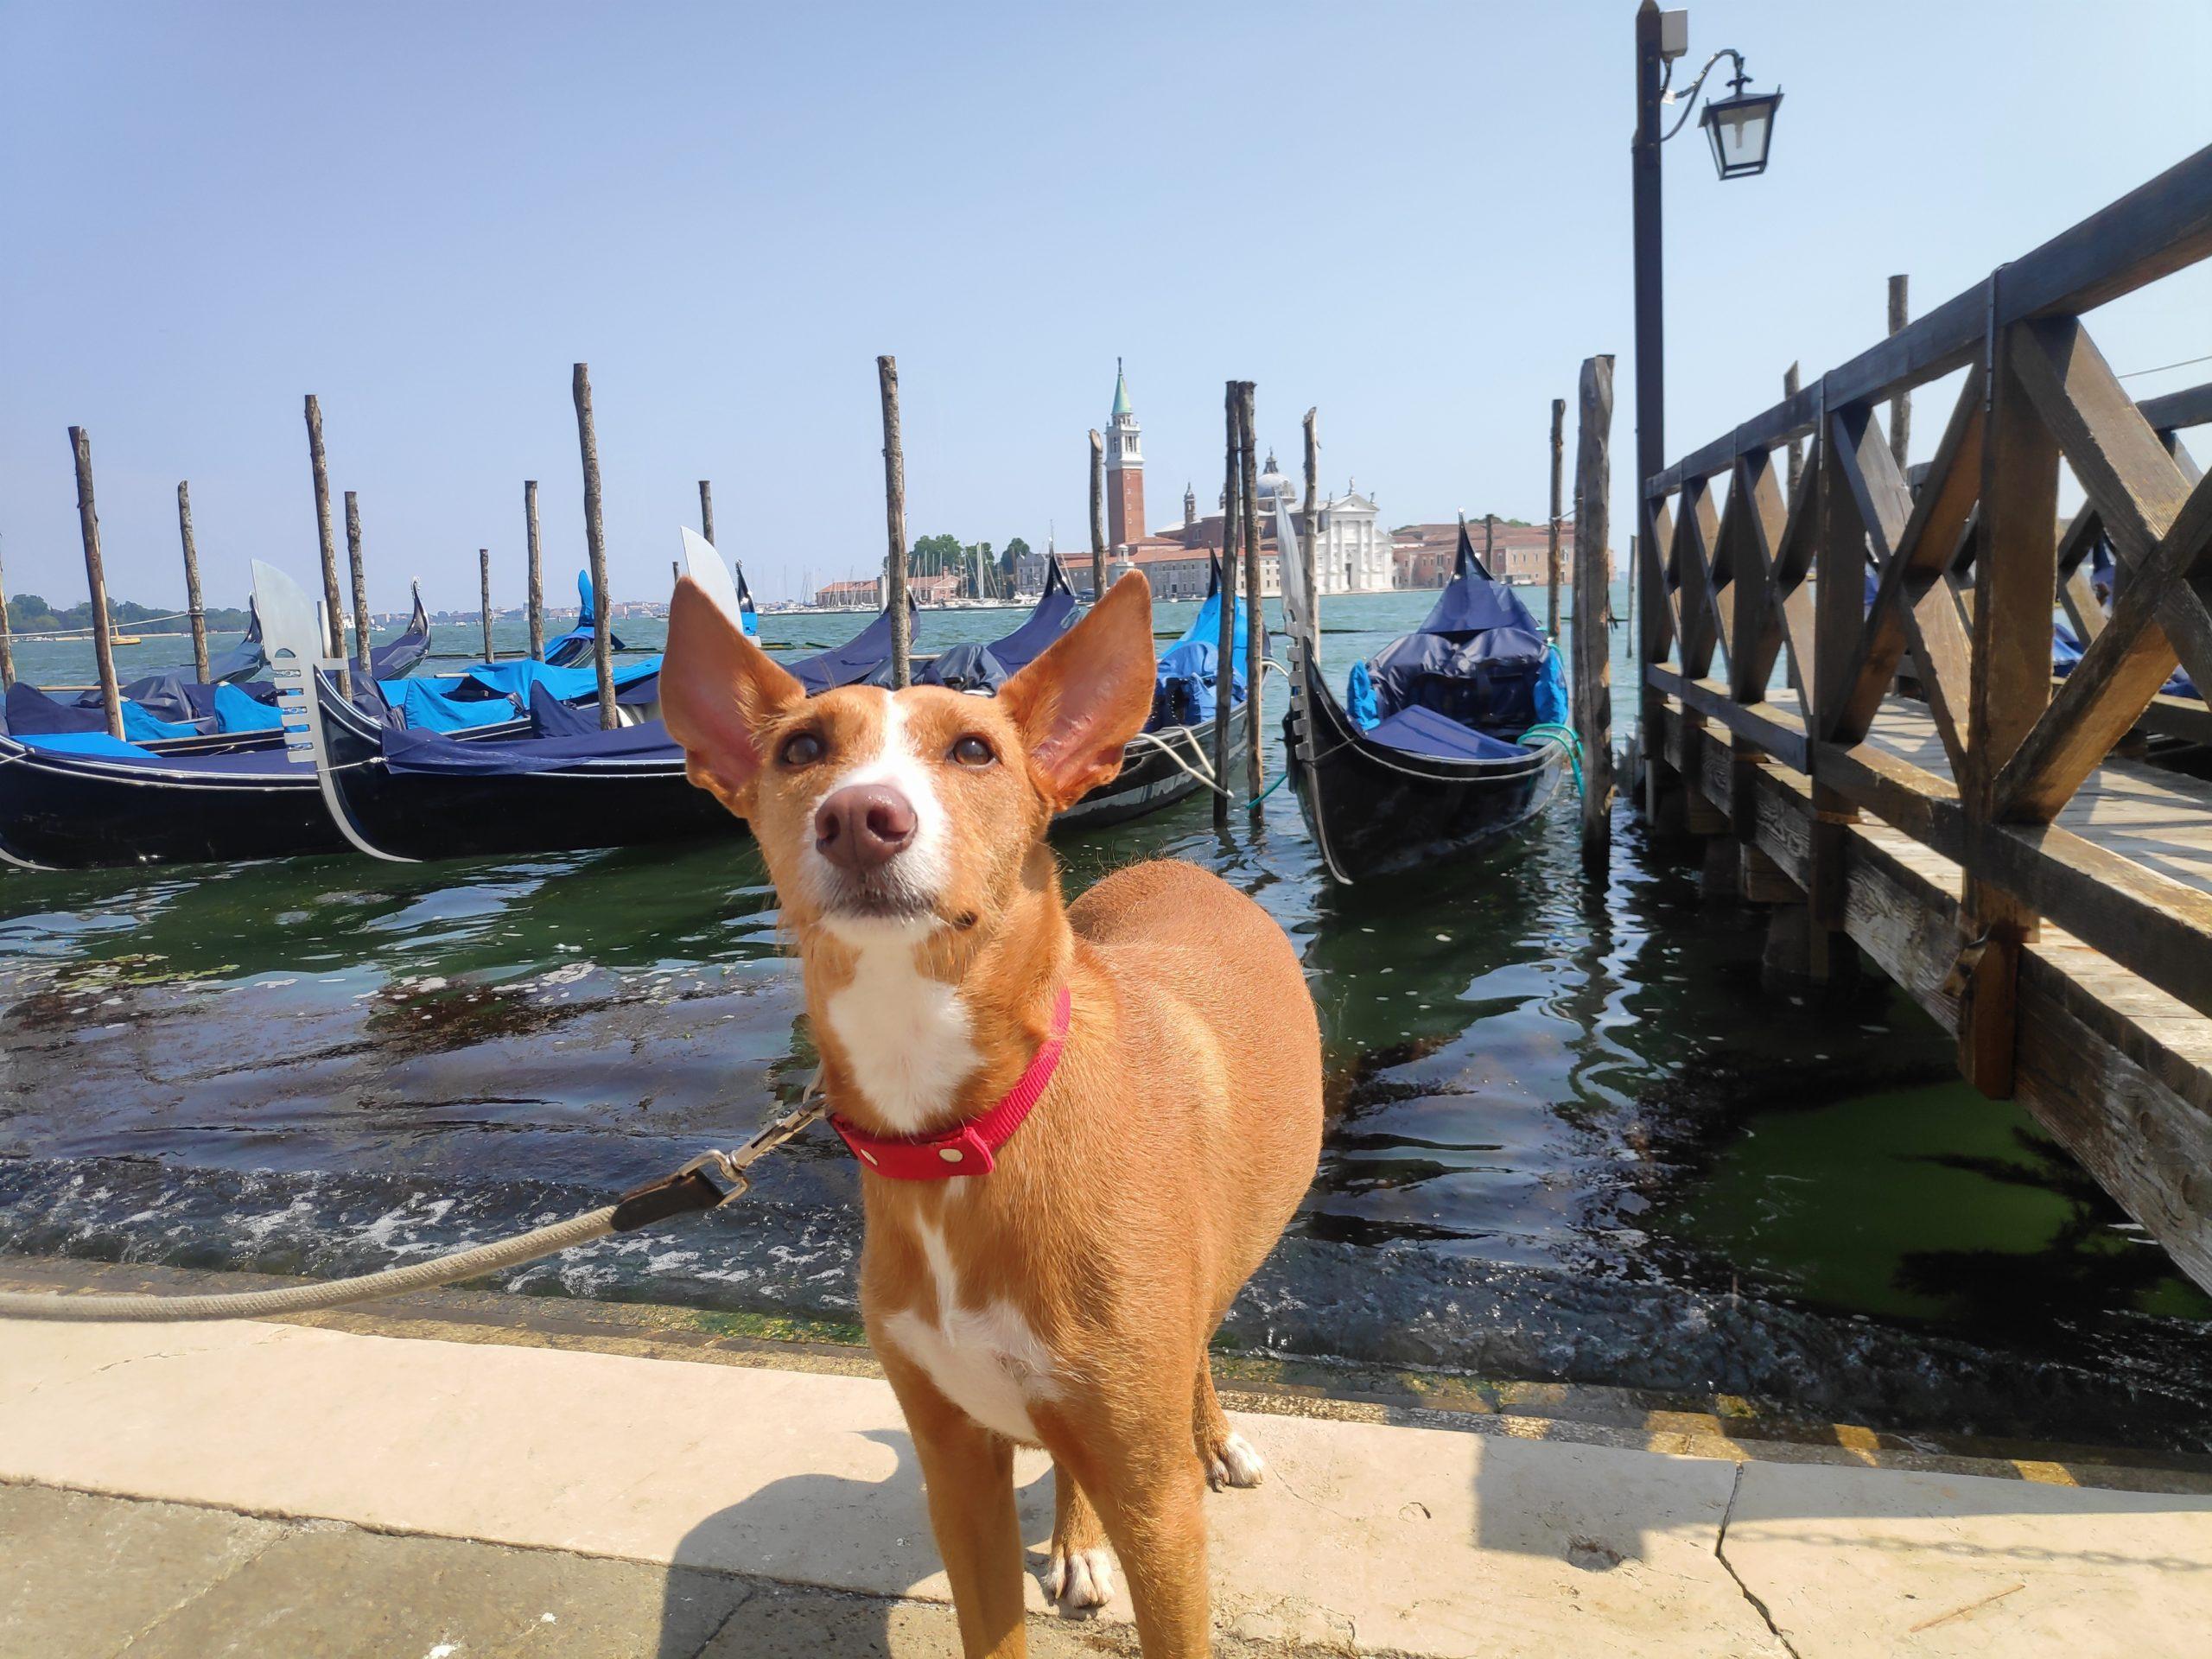 Isla de Guidecca en Venecia